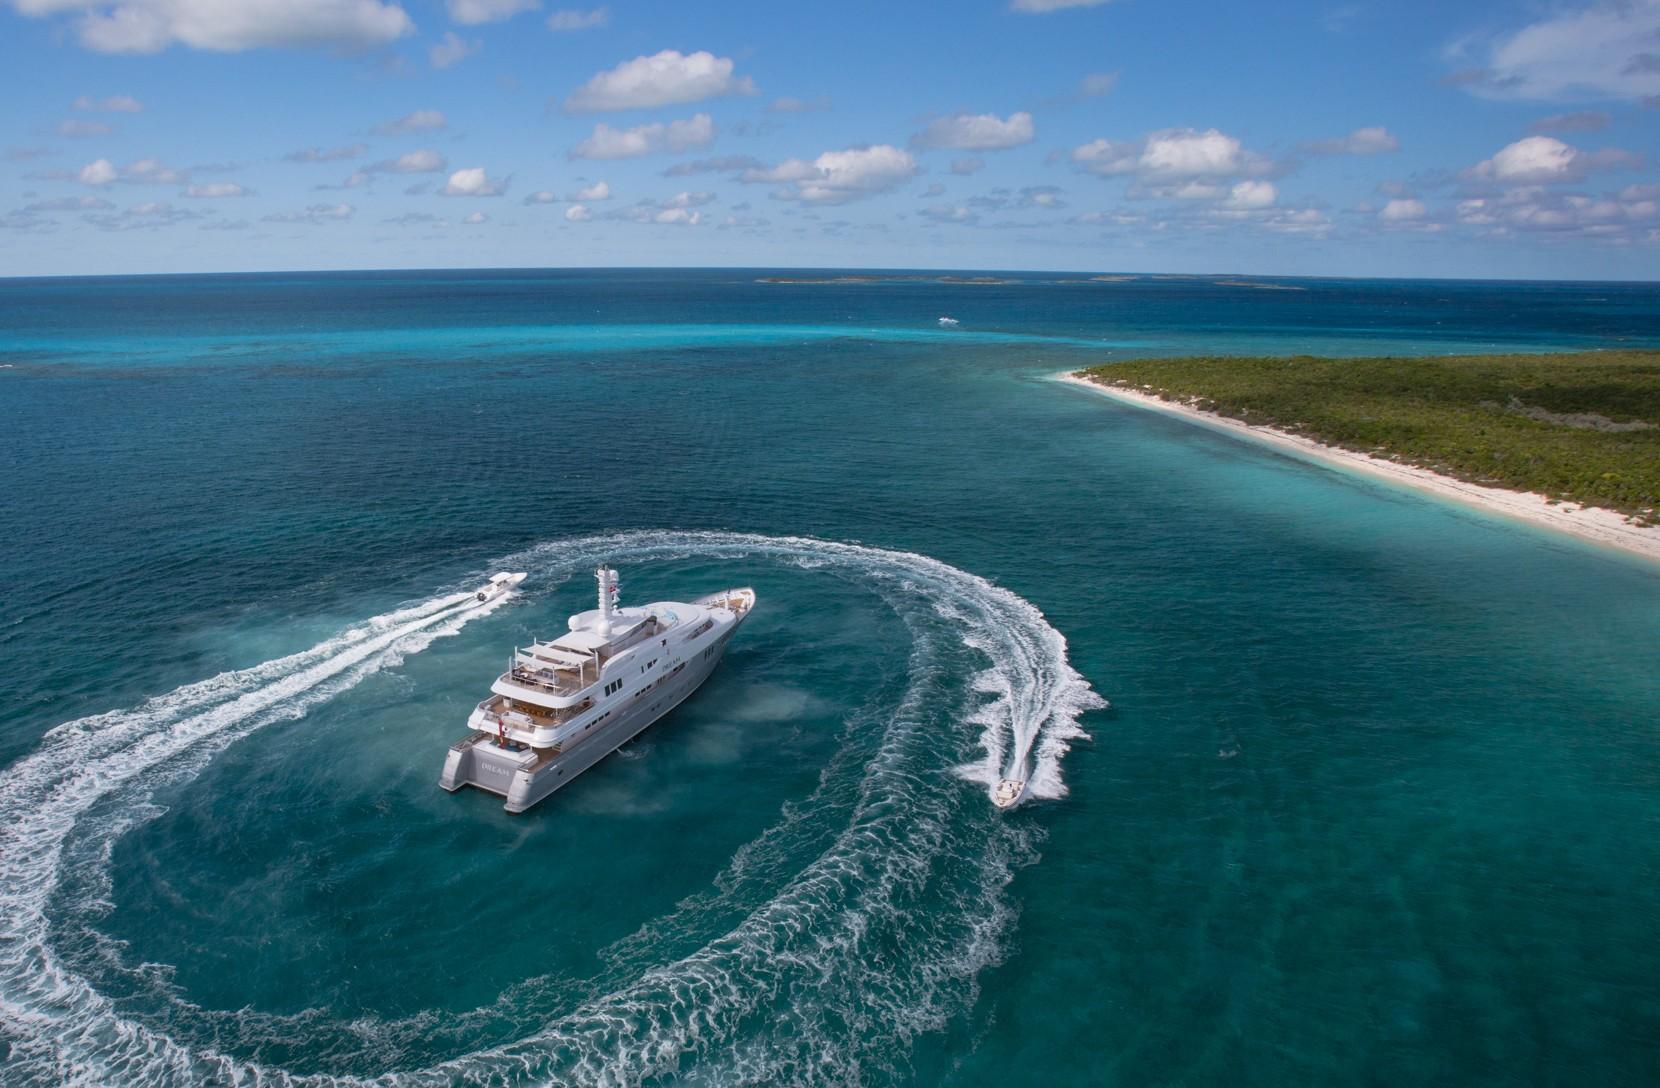 Alquiler de yates de lujo en la polinesia Francesa. Barcos baratos de alquiler en Polinesia francesa